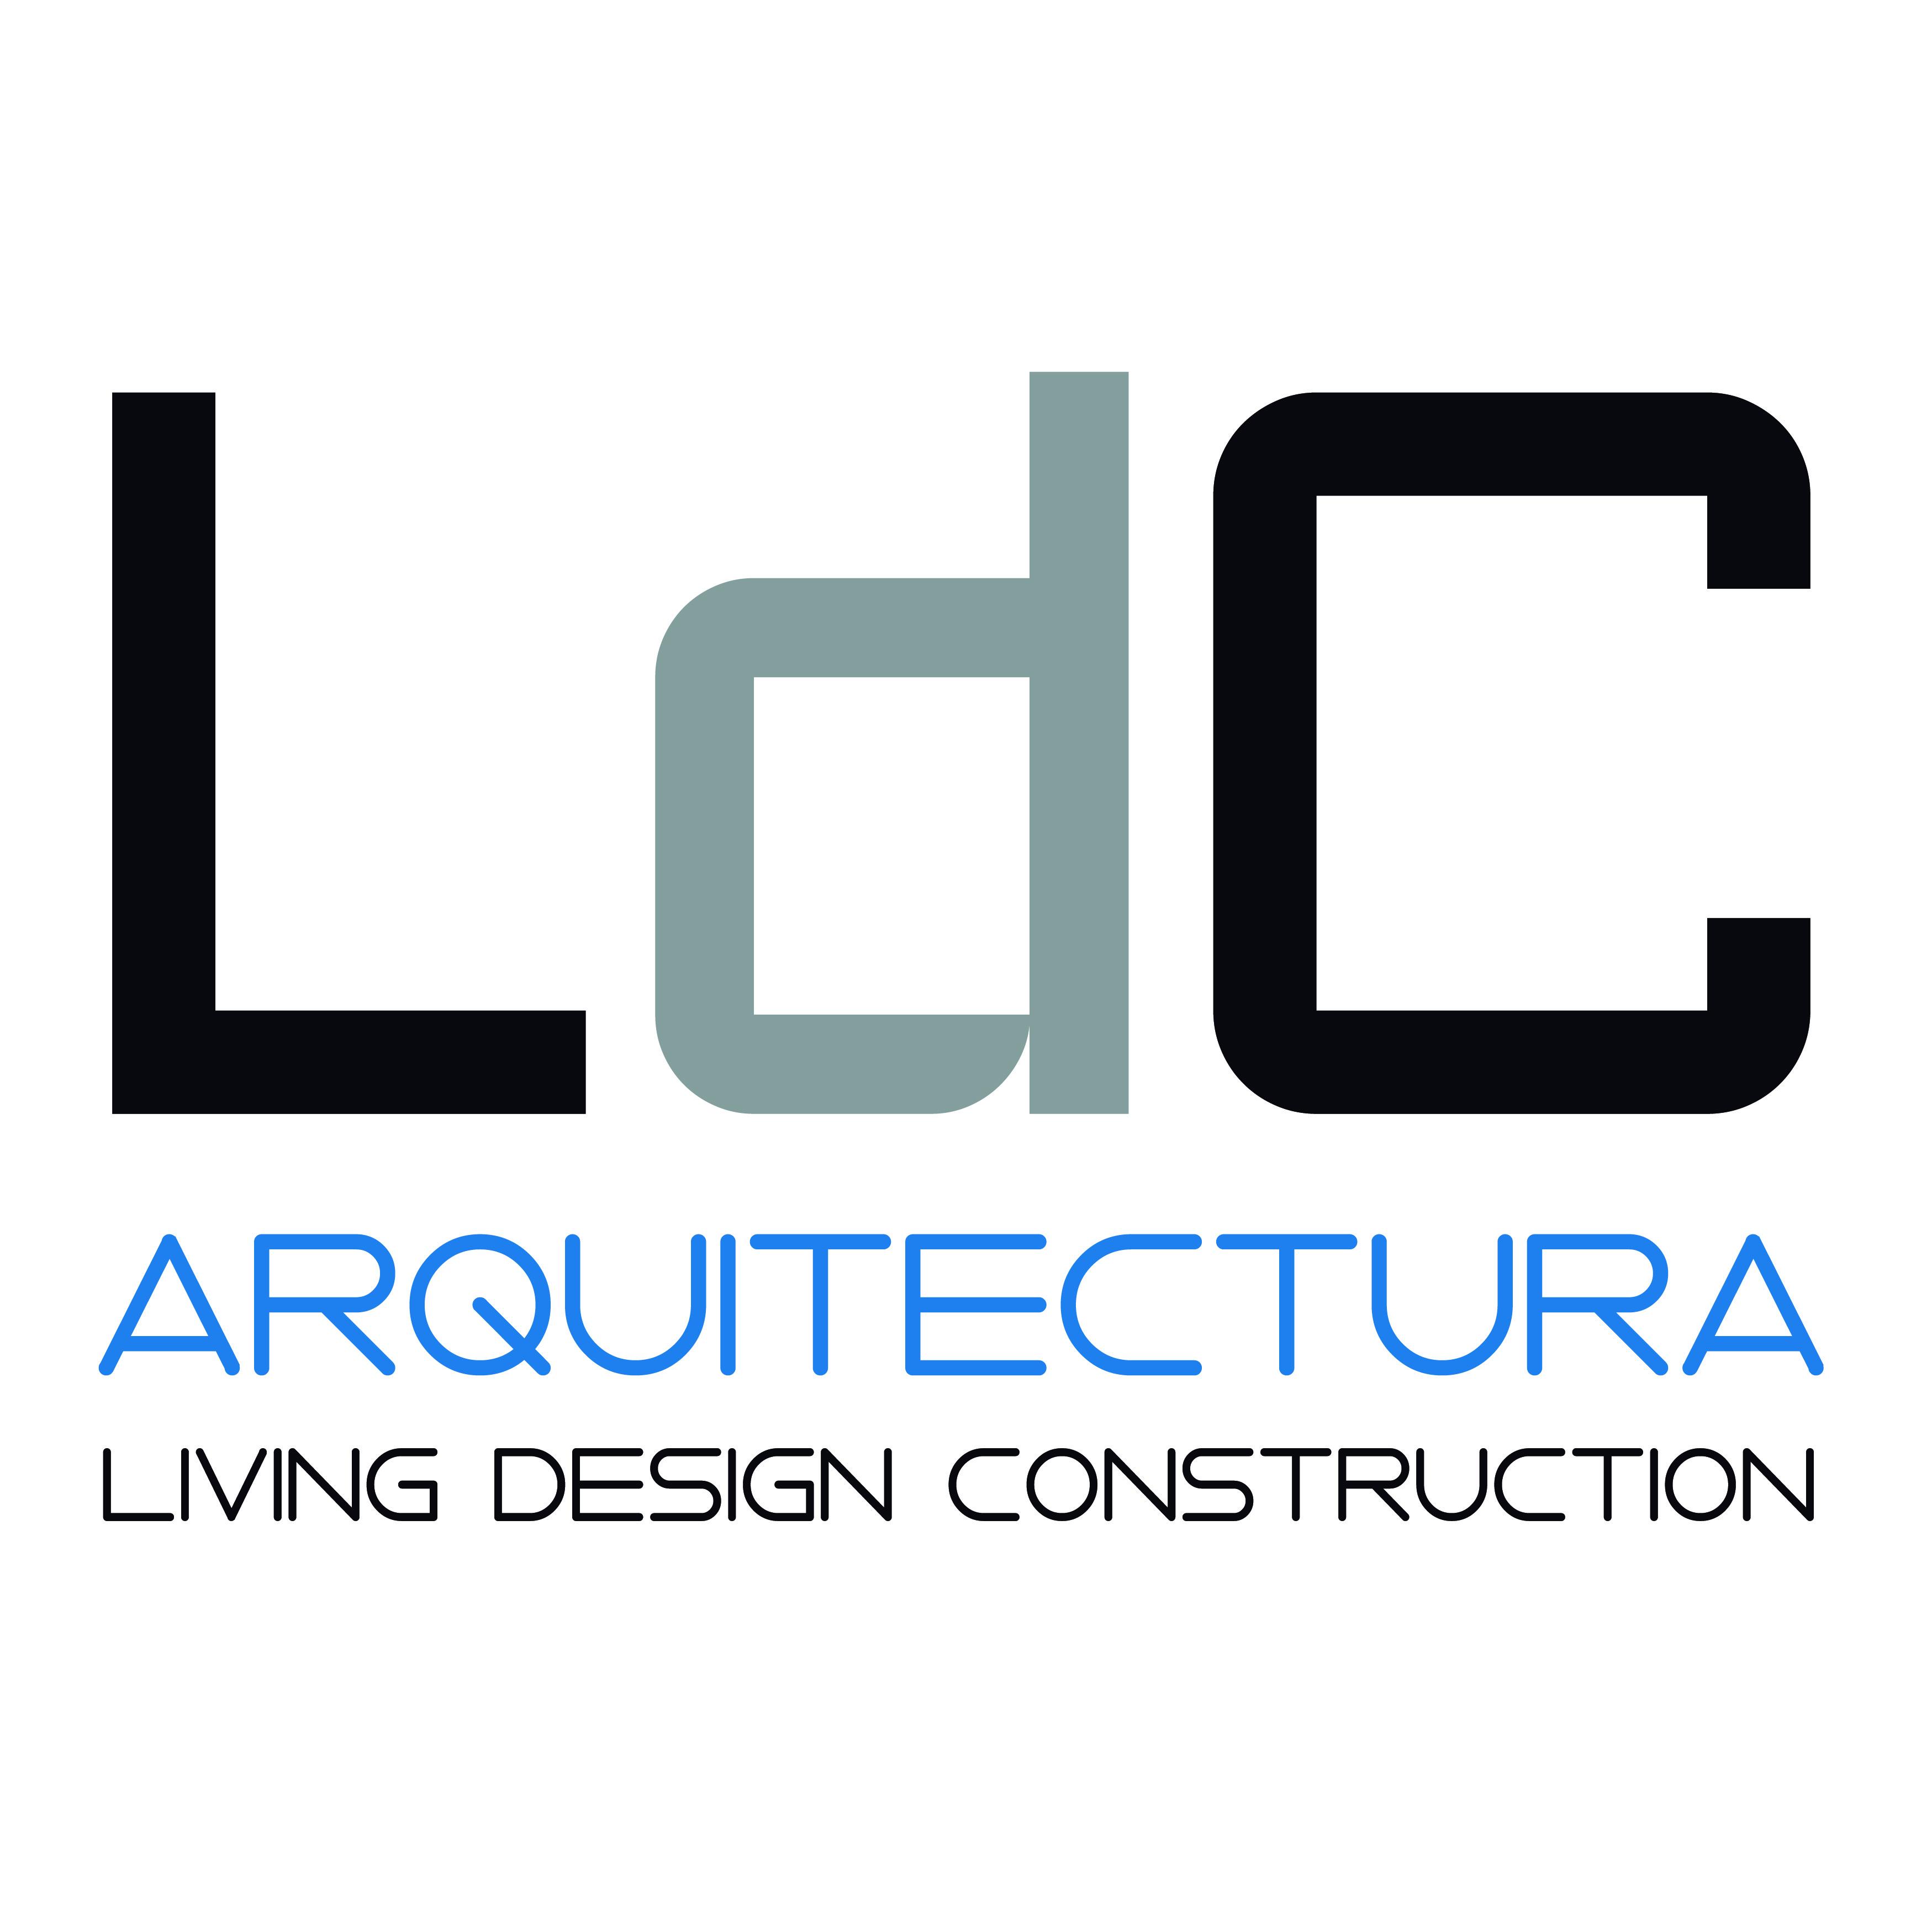 LDC ARQUITECTURA, Enrique López de Coca Molina